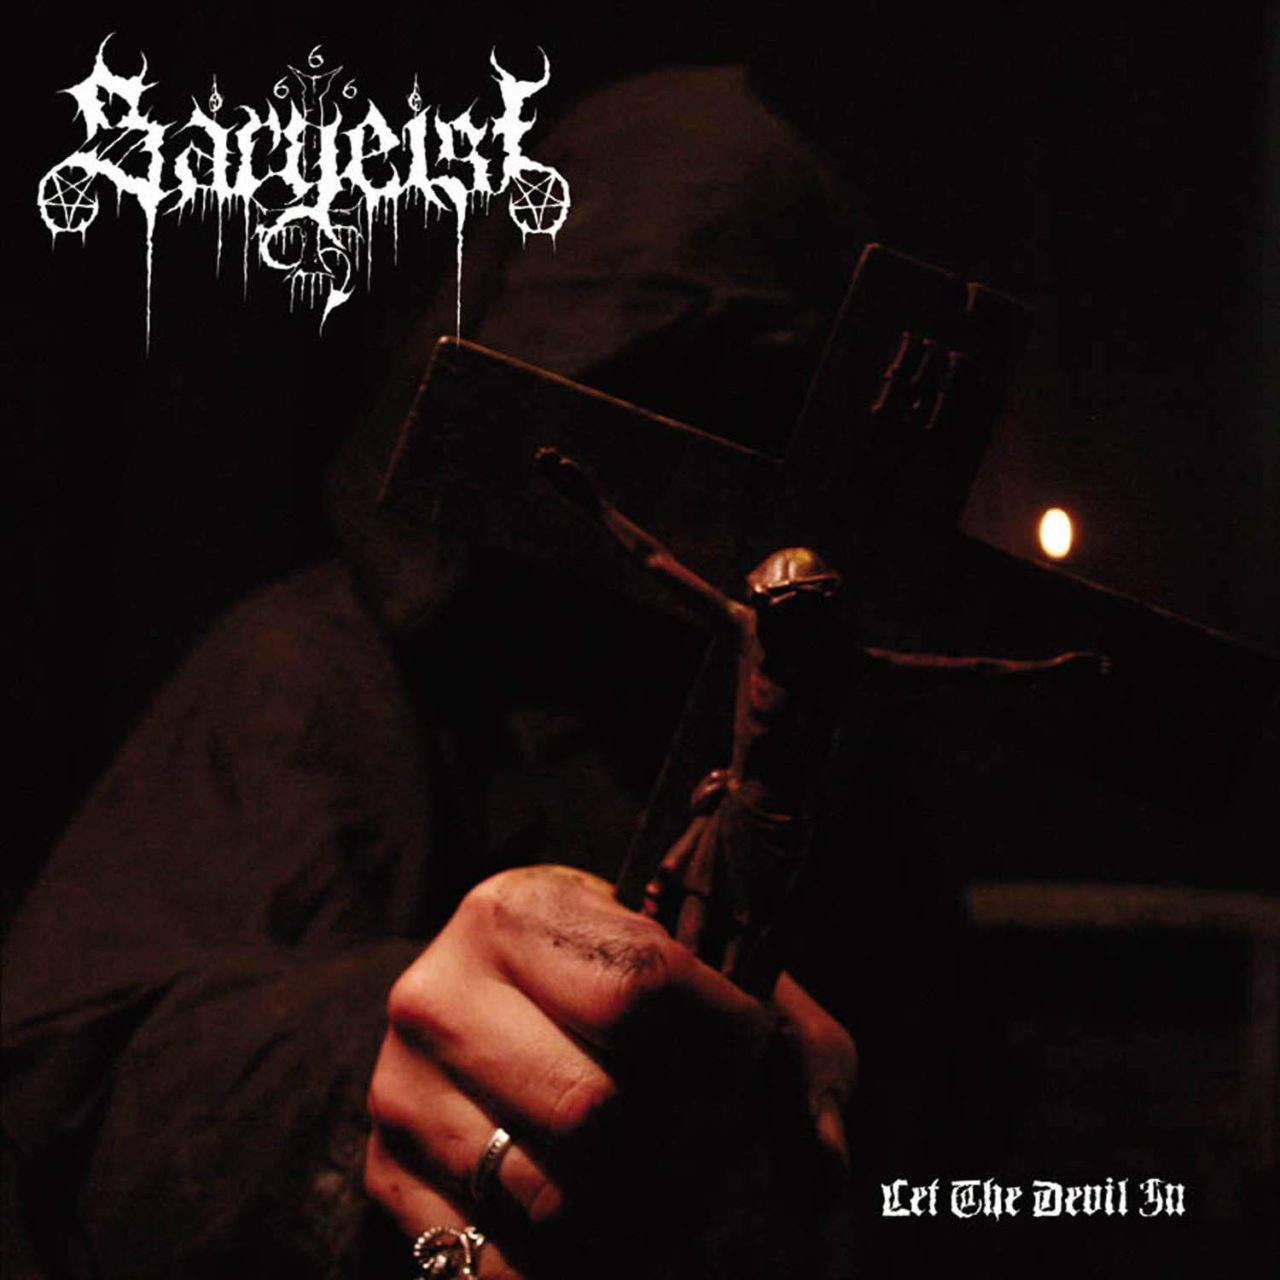 Sargeist - Let The Devil In